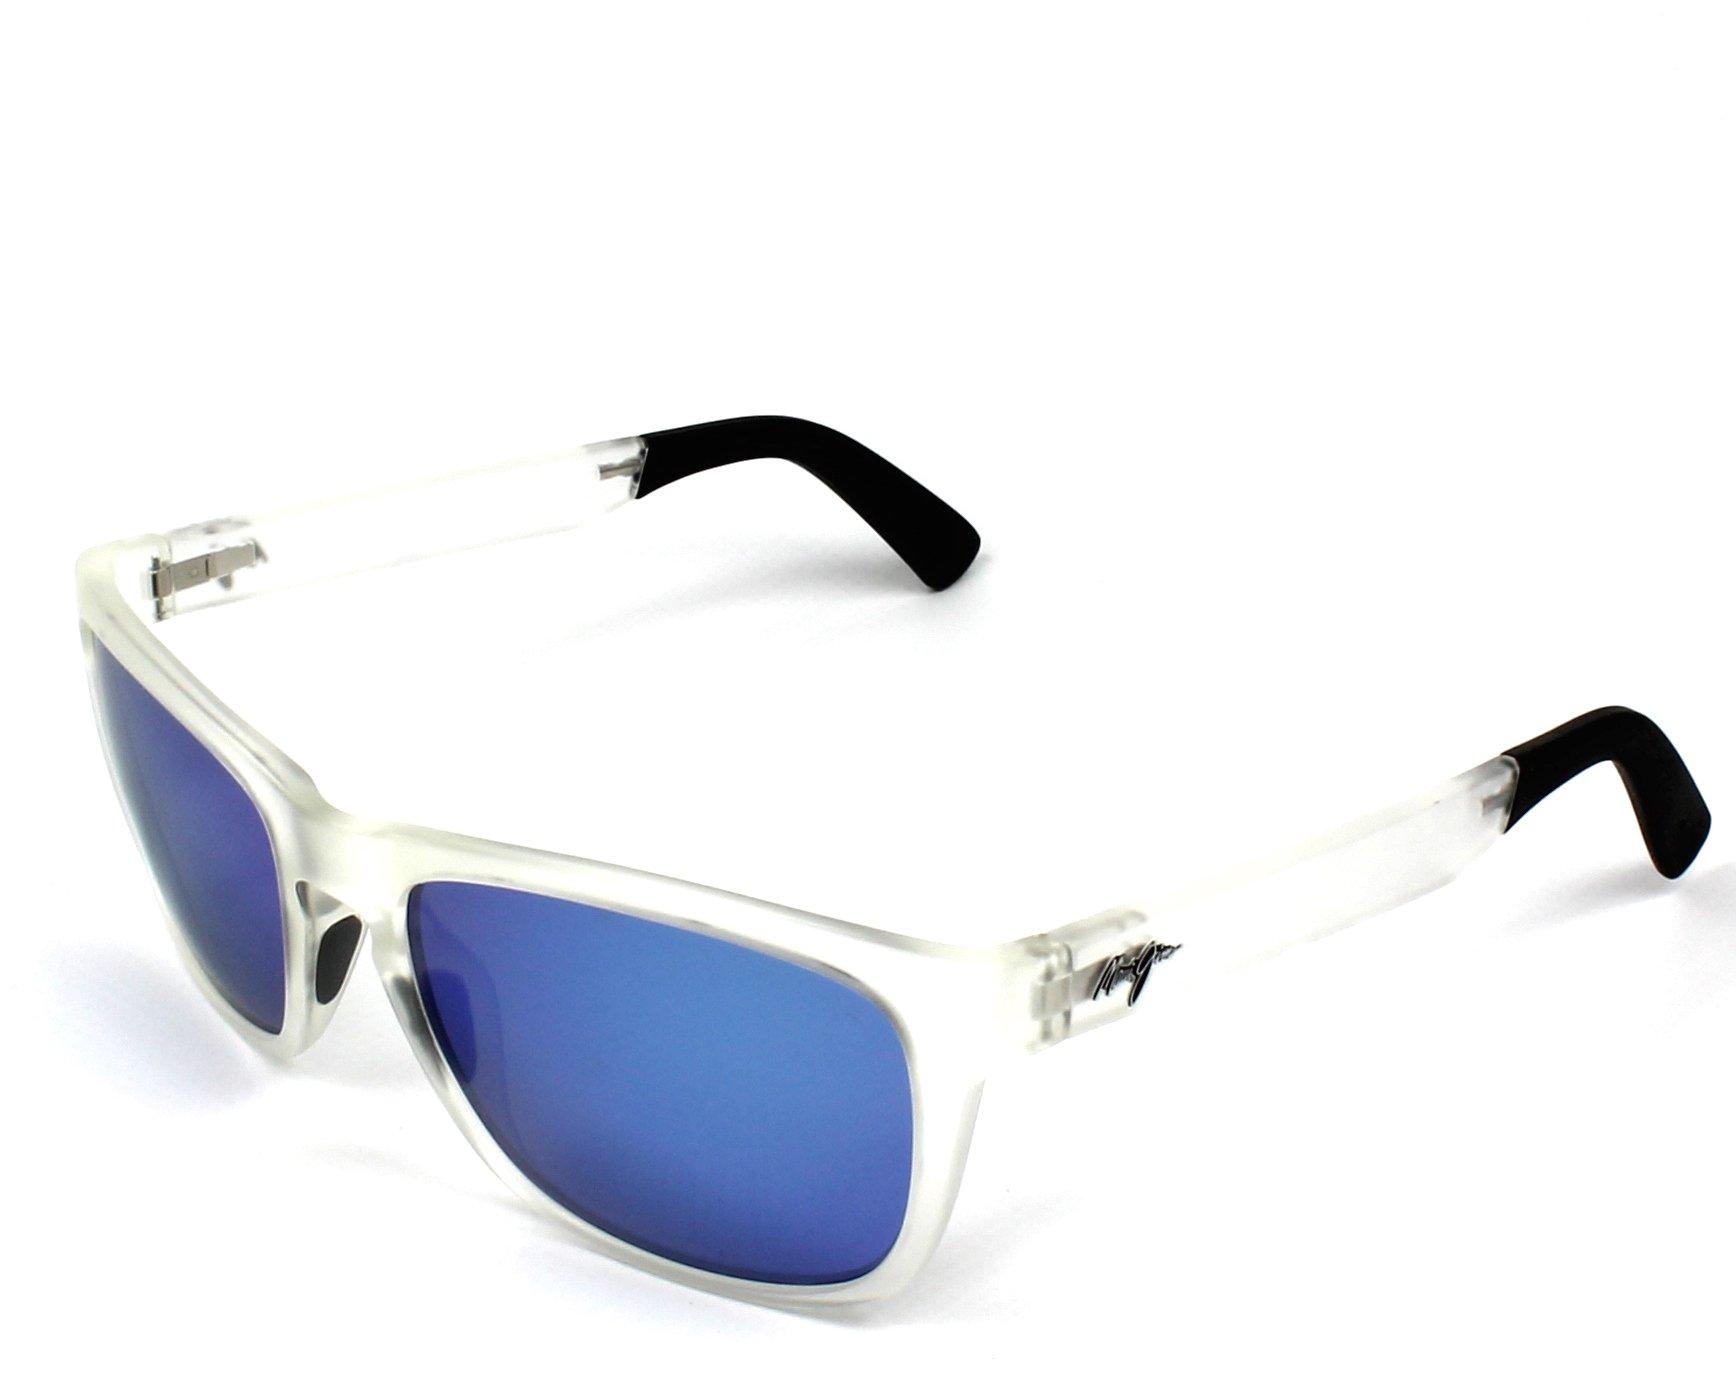 c21695e5df Polarized. Sunglasses Maui Jim B-755 05CM 58-18 Crystal Crystal profile view